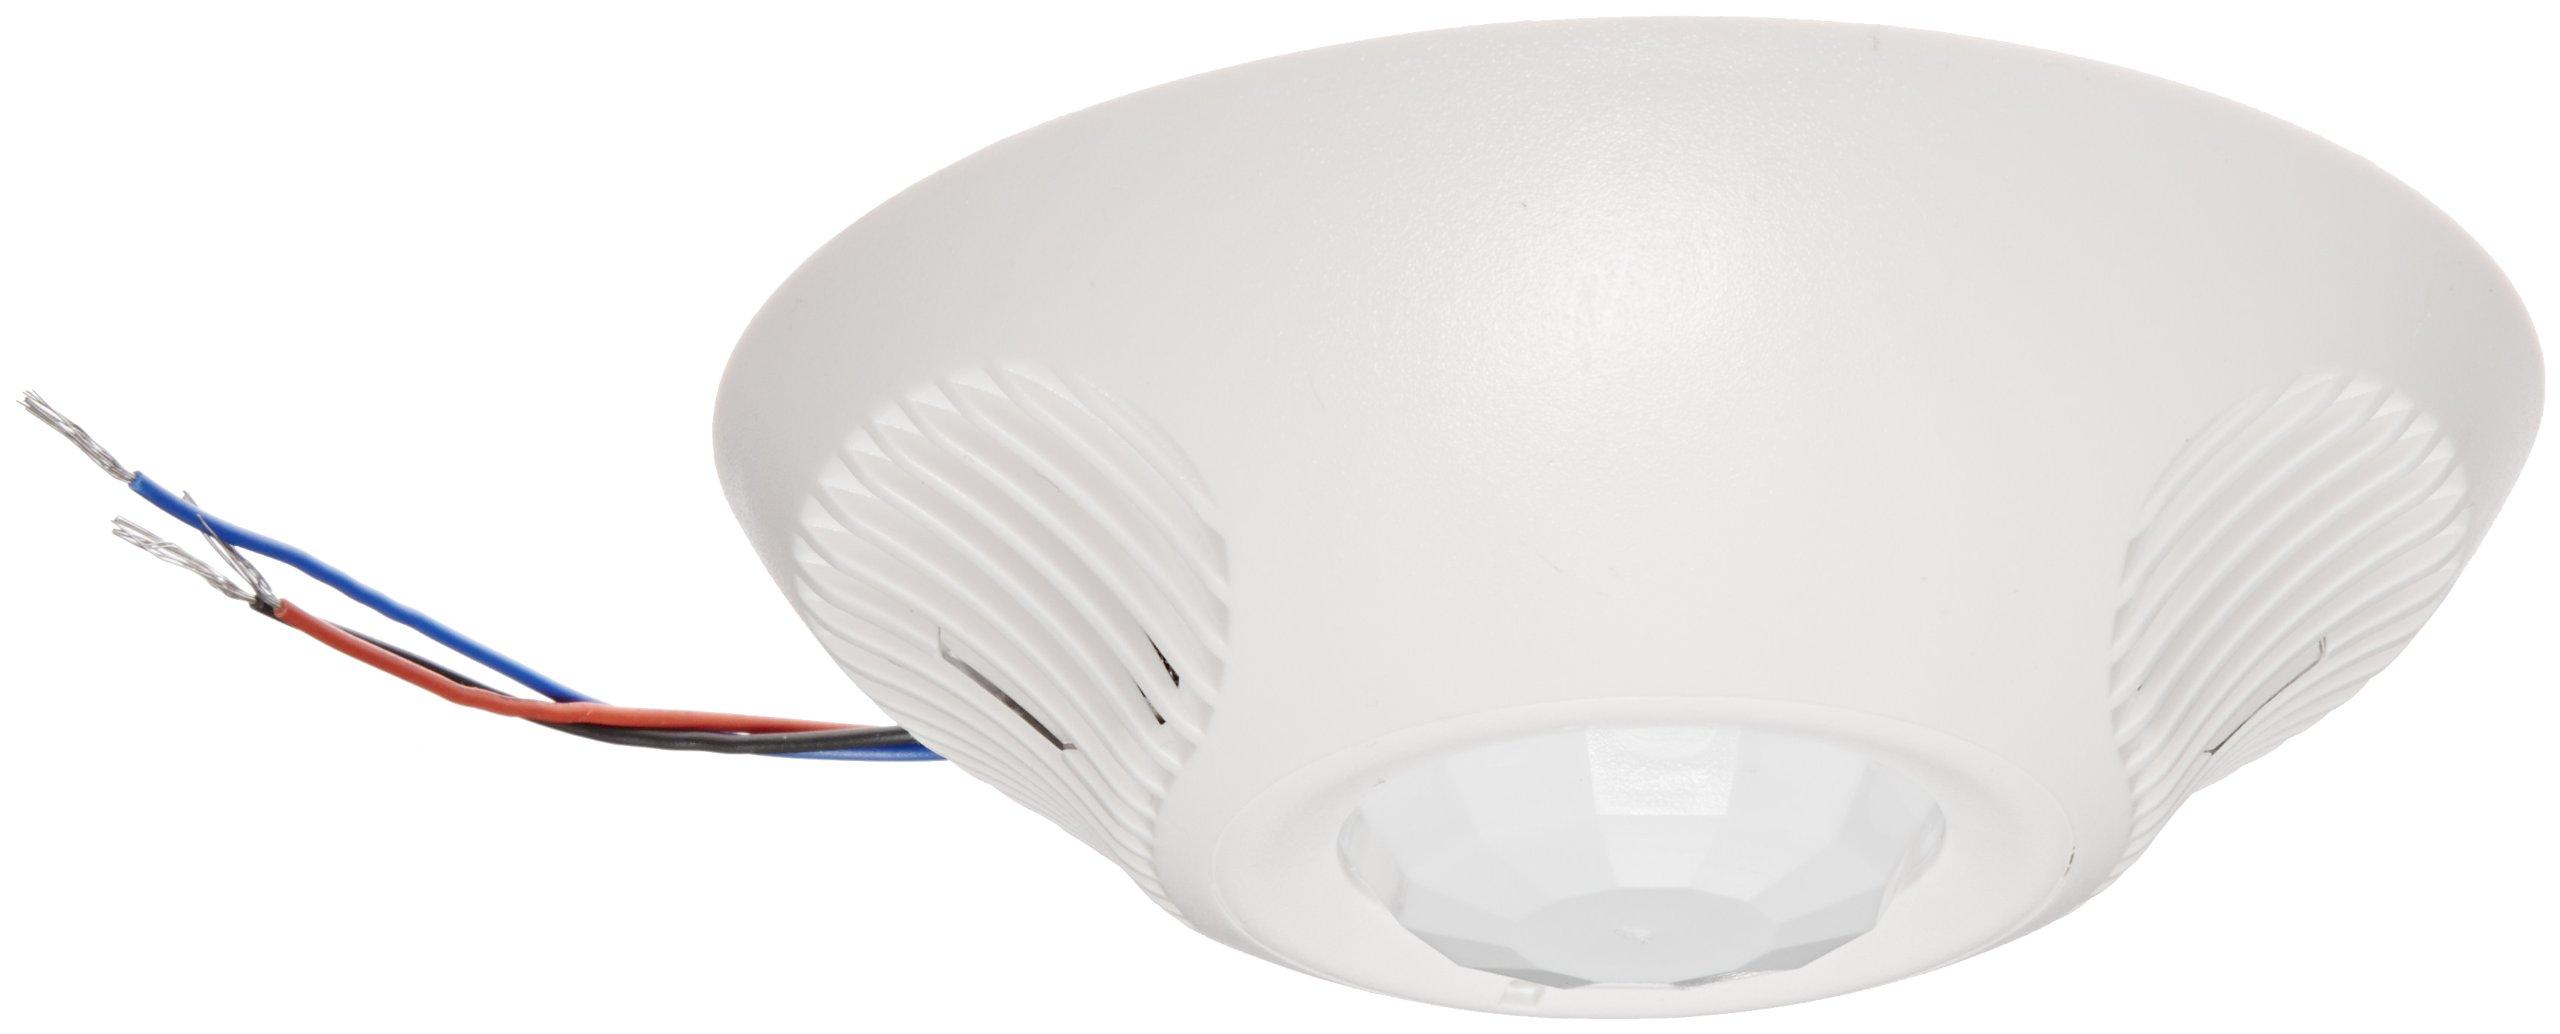 Hubbell ATD2000C Ceiling Sensor, Adaptive Technology, Ultrasonic, Passive Infrared, White, 2000sqft Max Sensing Range by Hubbell